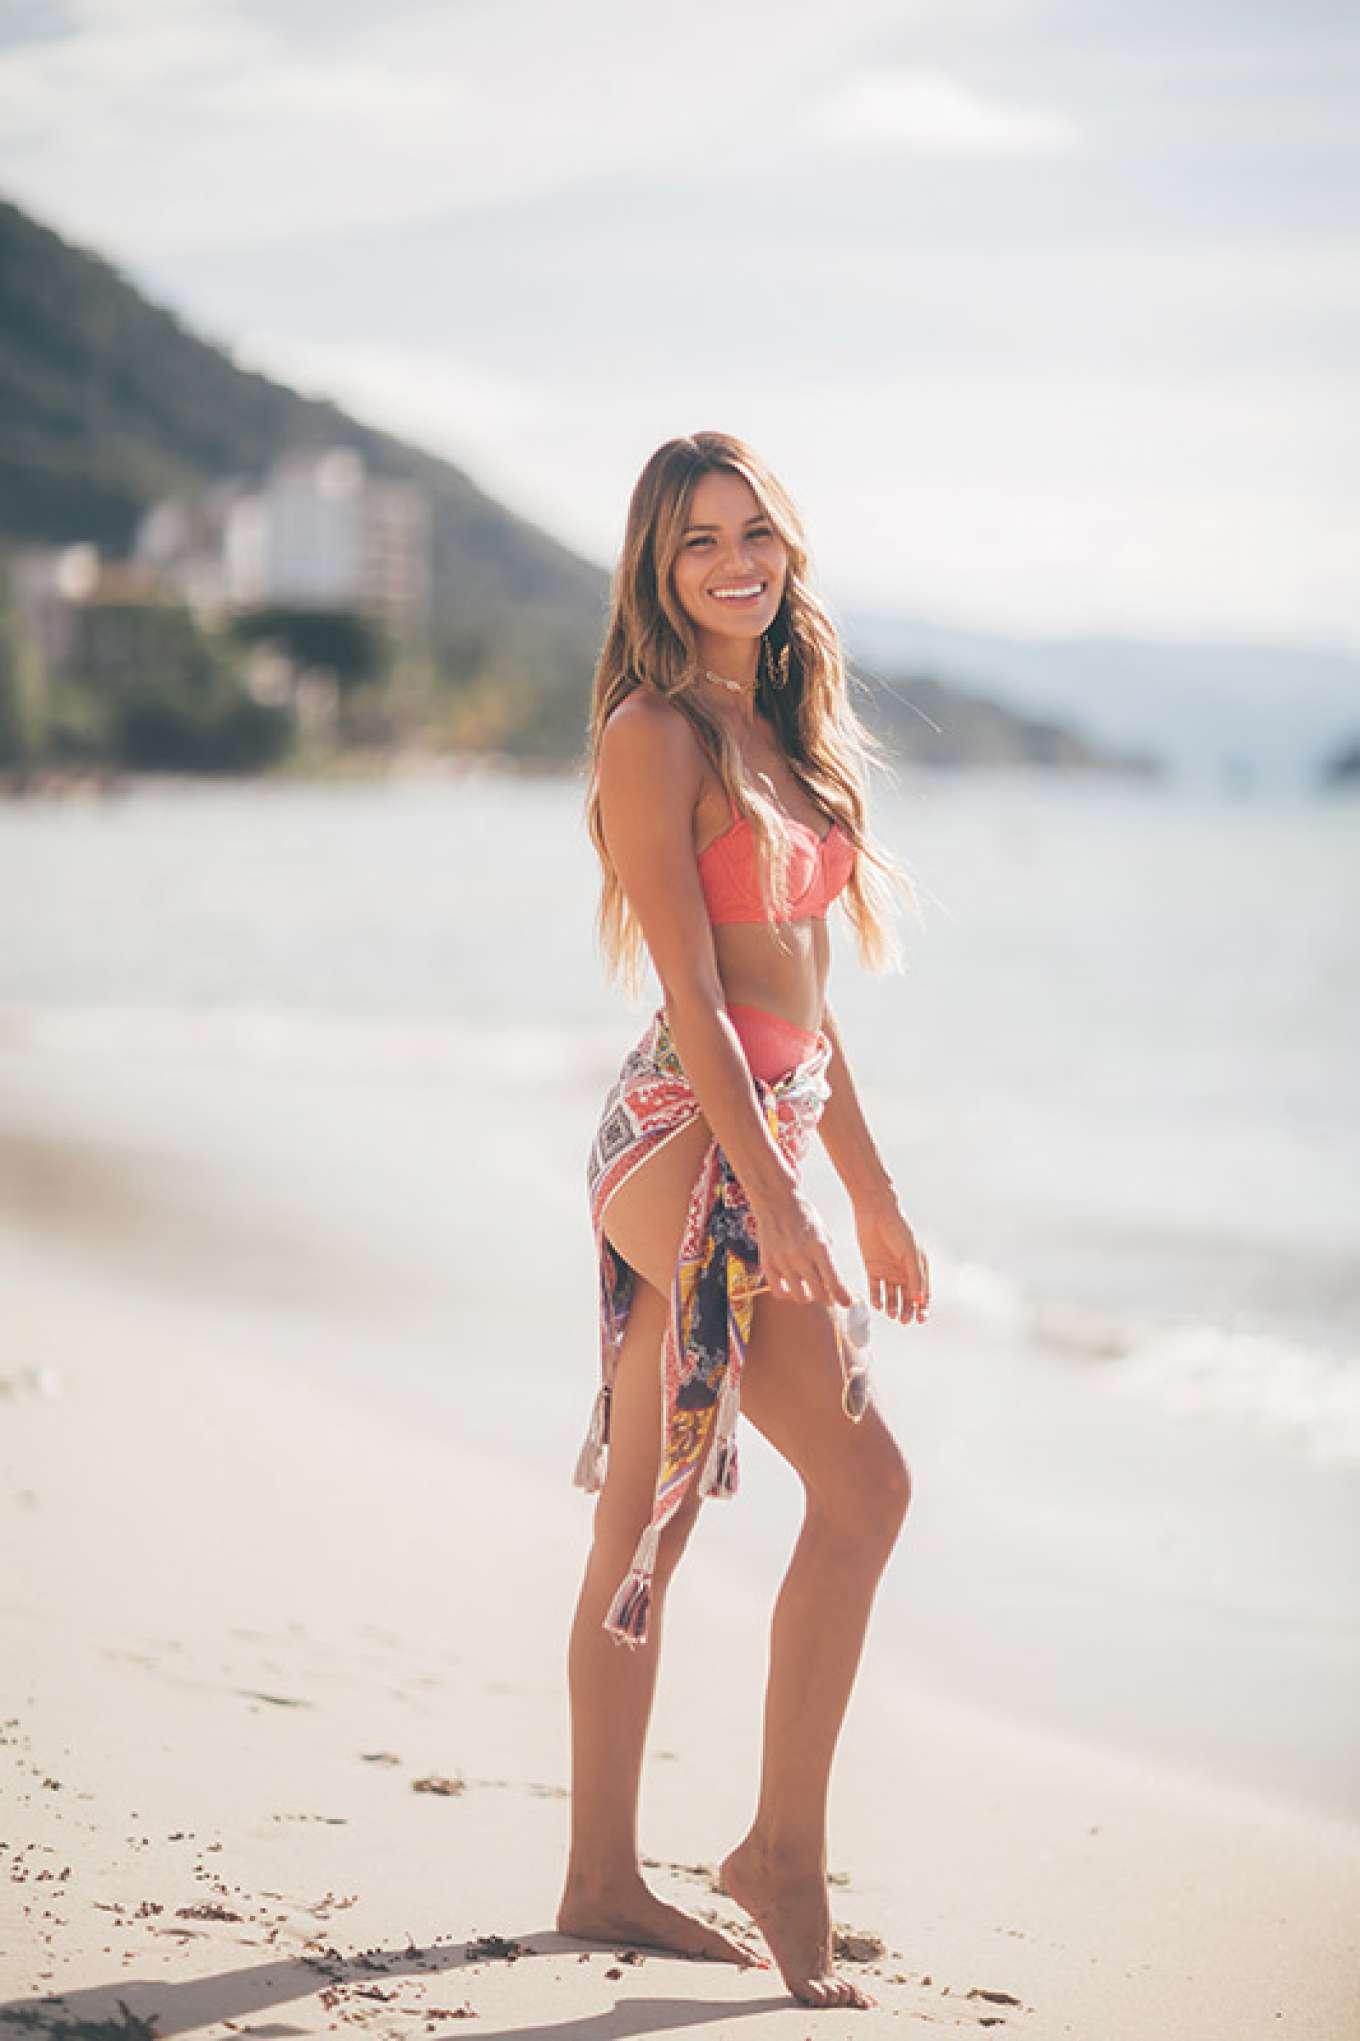 Madison Reed 2019 : Madison Reed – Puerto Vallarta with Modeliste Magazine Mode Around the Globe 2019-11